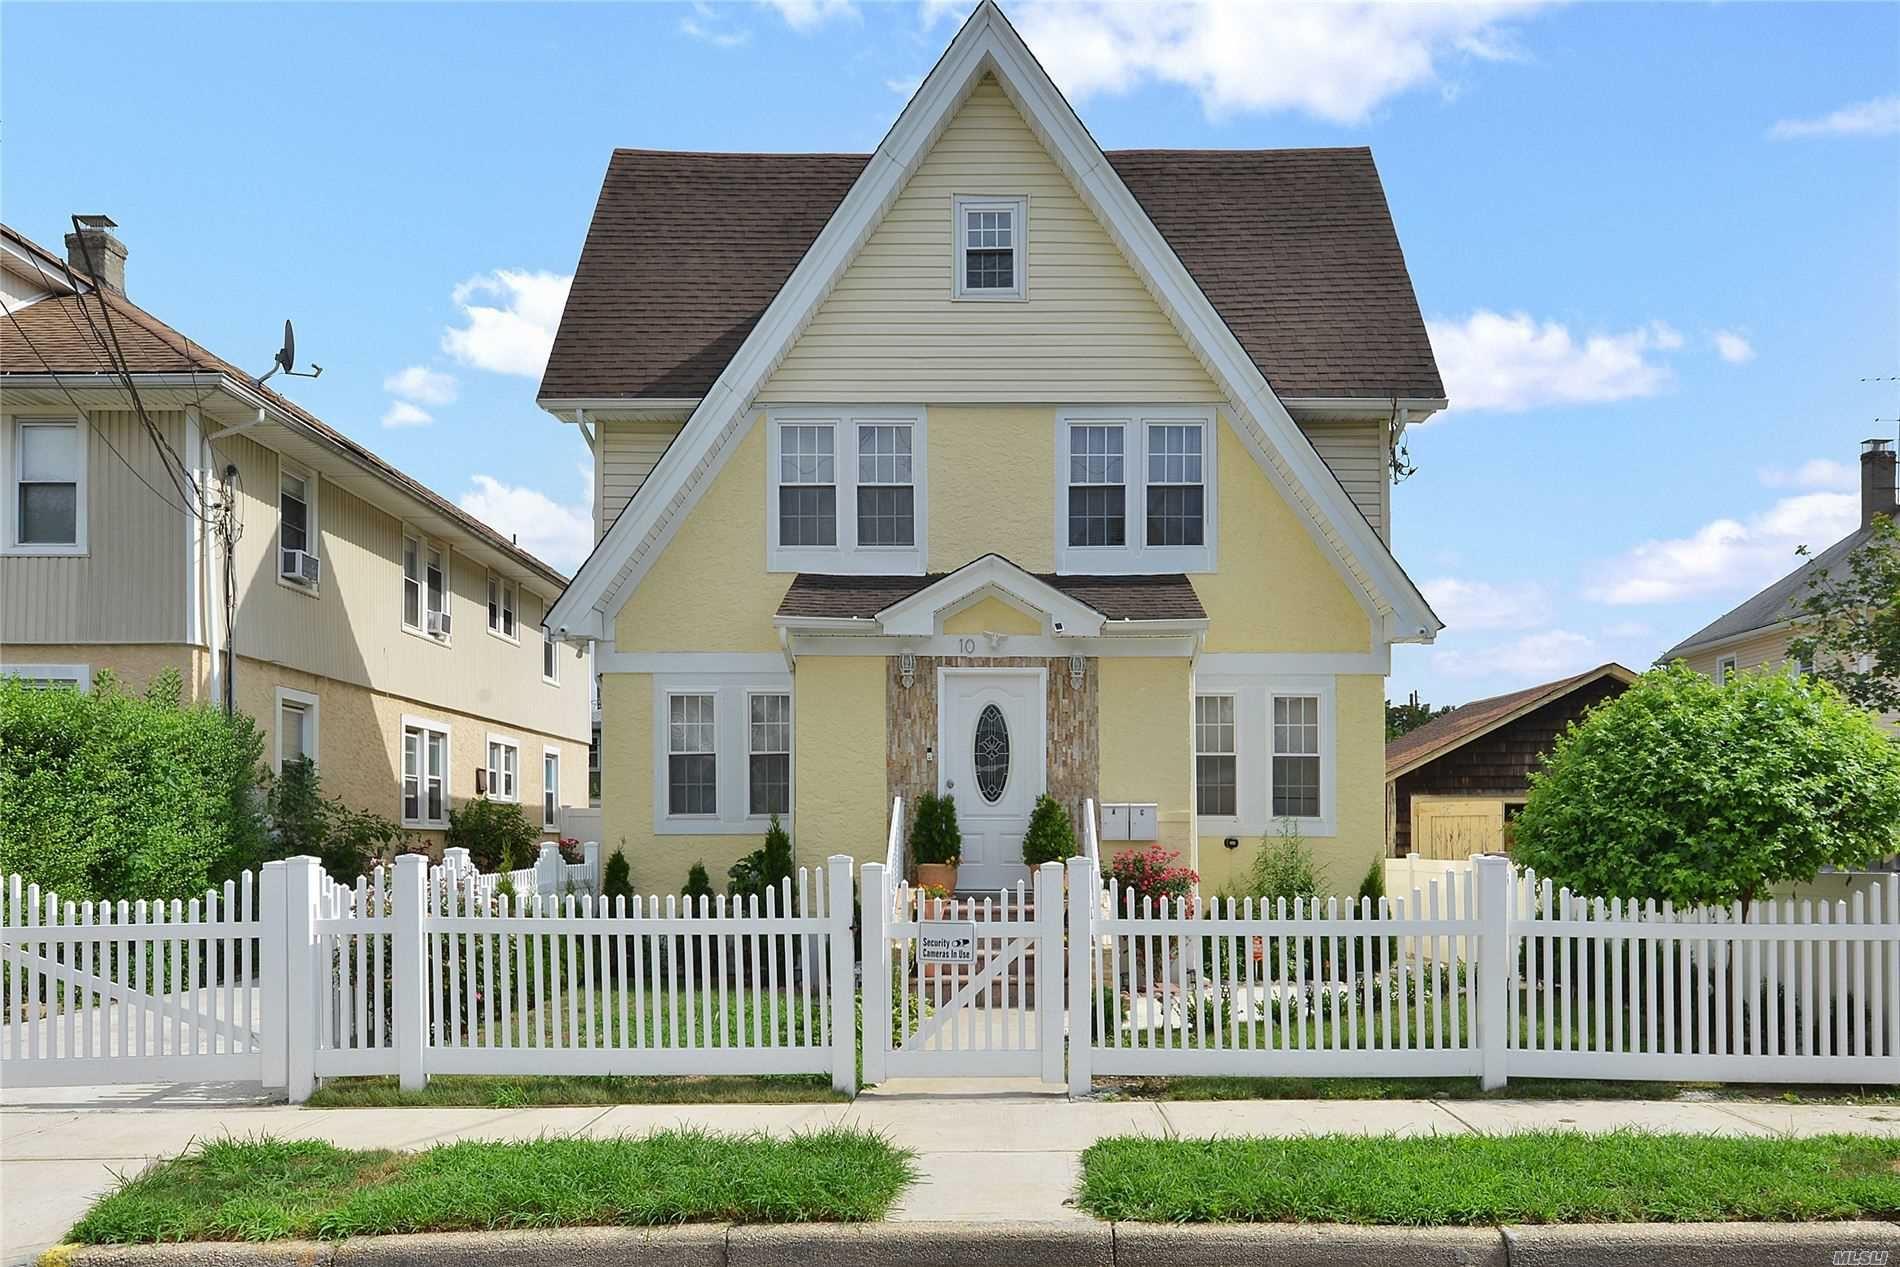 10 Van Cott Avenue, Hempstead, NY 11550 - MLS#: 3239434